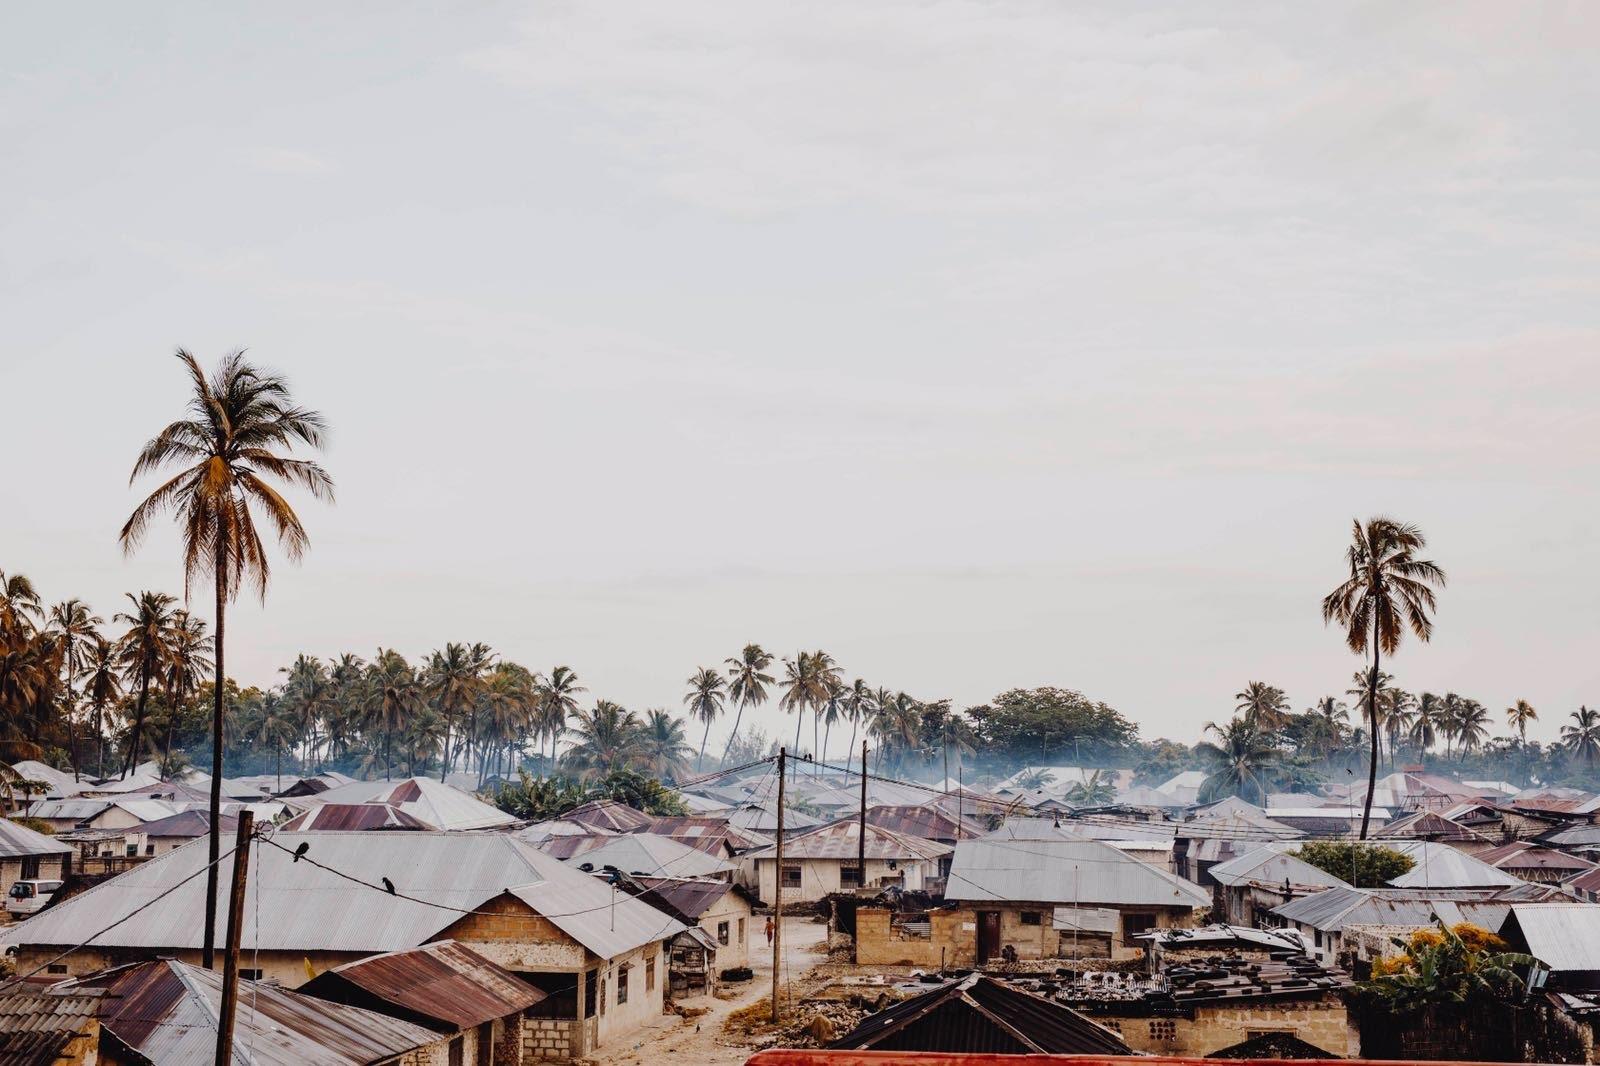 paje-village-zanzibar